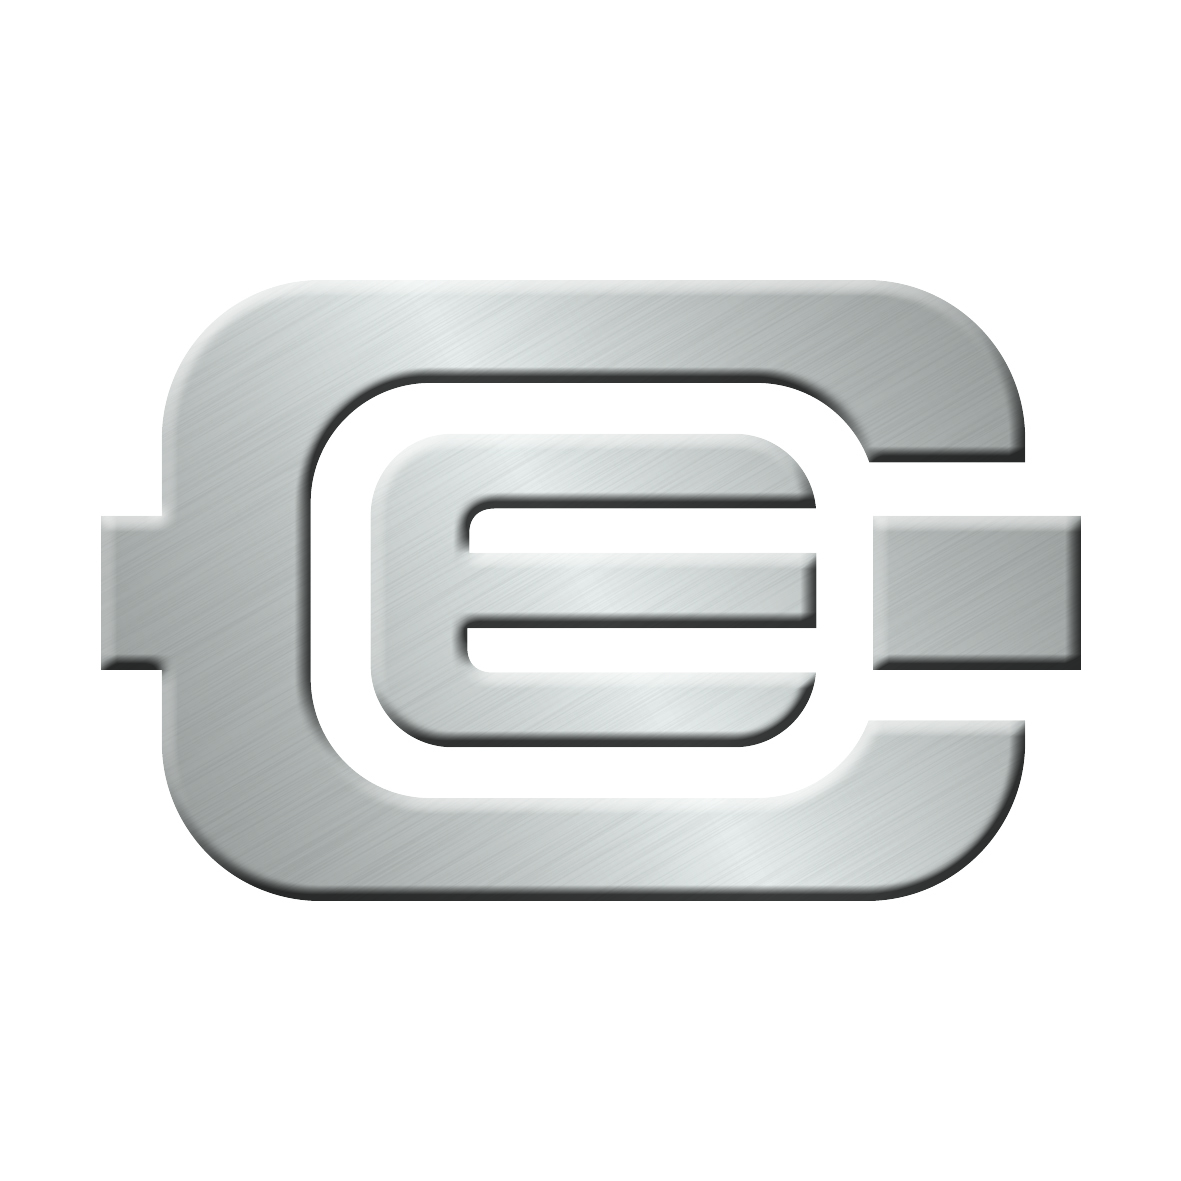 EC_ICON.jpg